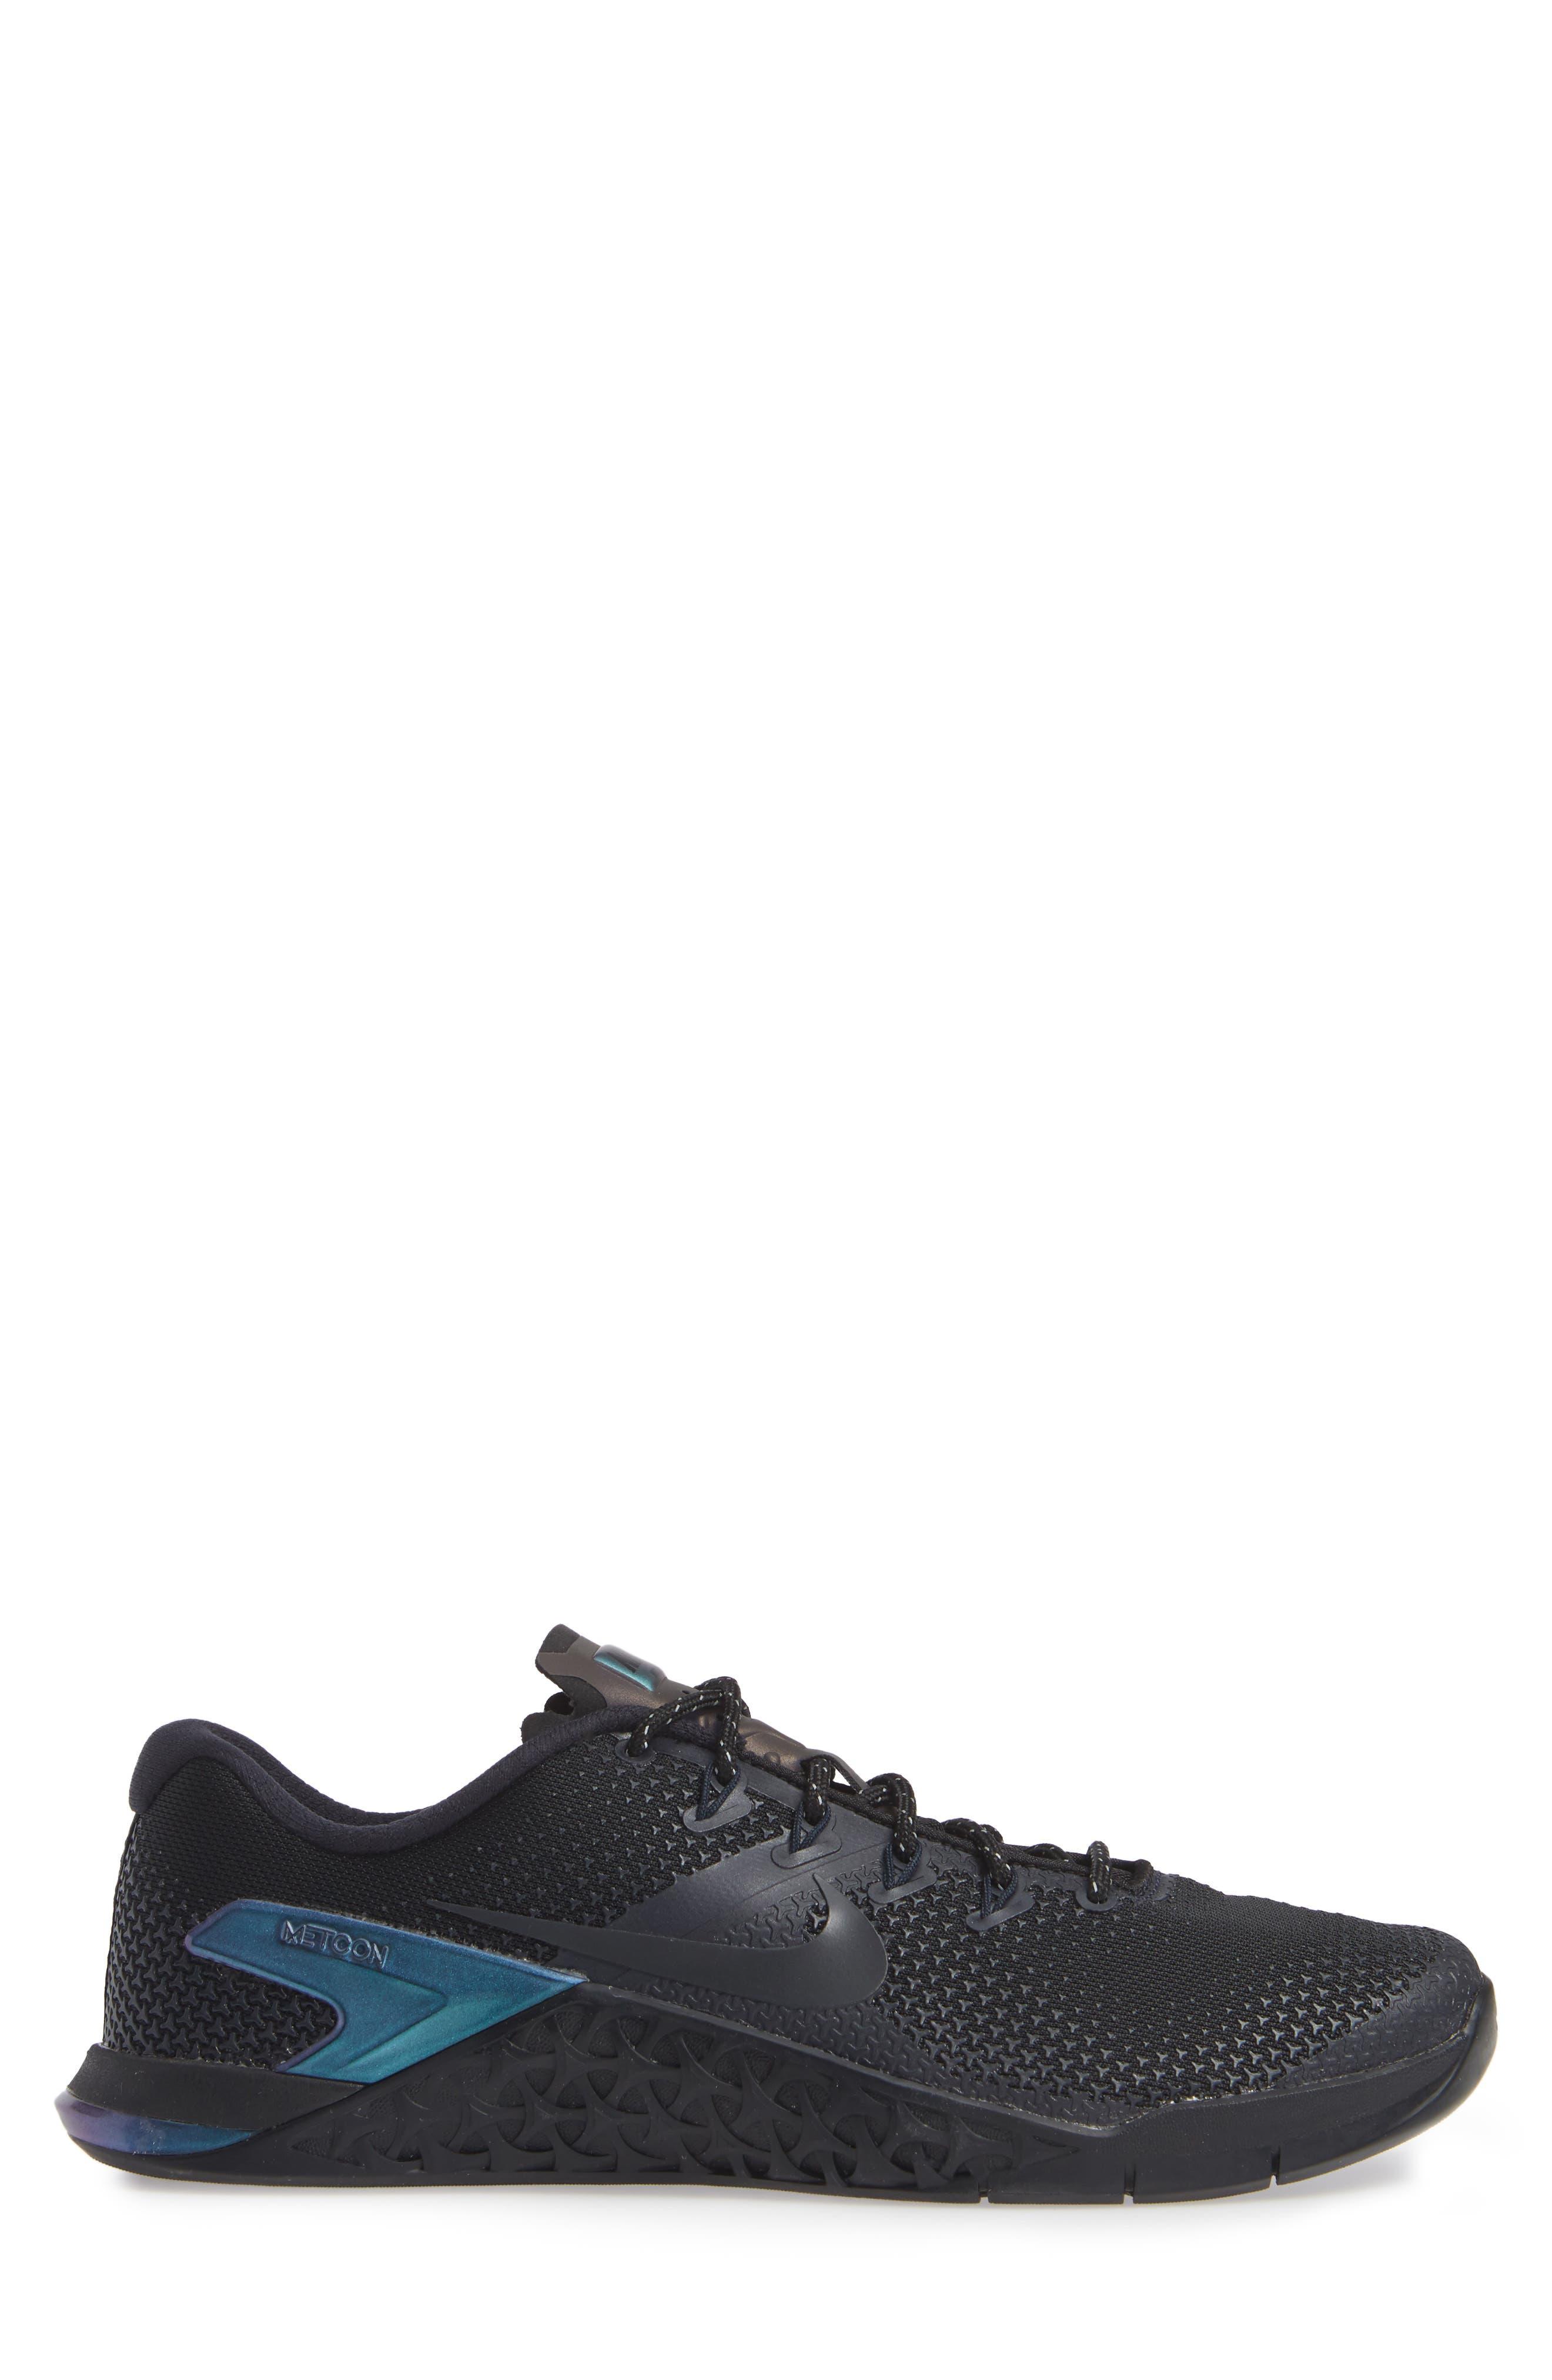 NIKE,                             Metcon 4 Prem Training Shoe,                             Alternate thumbnail 3, color,                             BLACK/ BLACK/ DARK OBSIDIAN